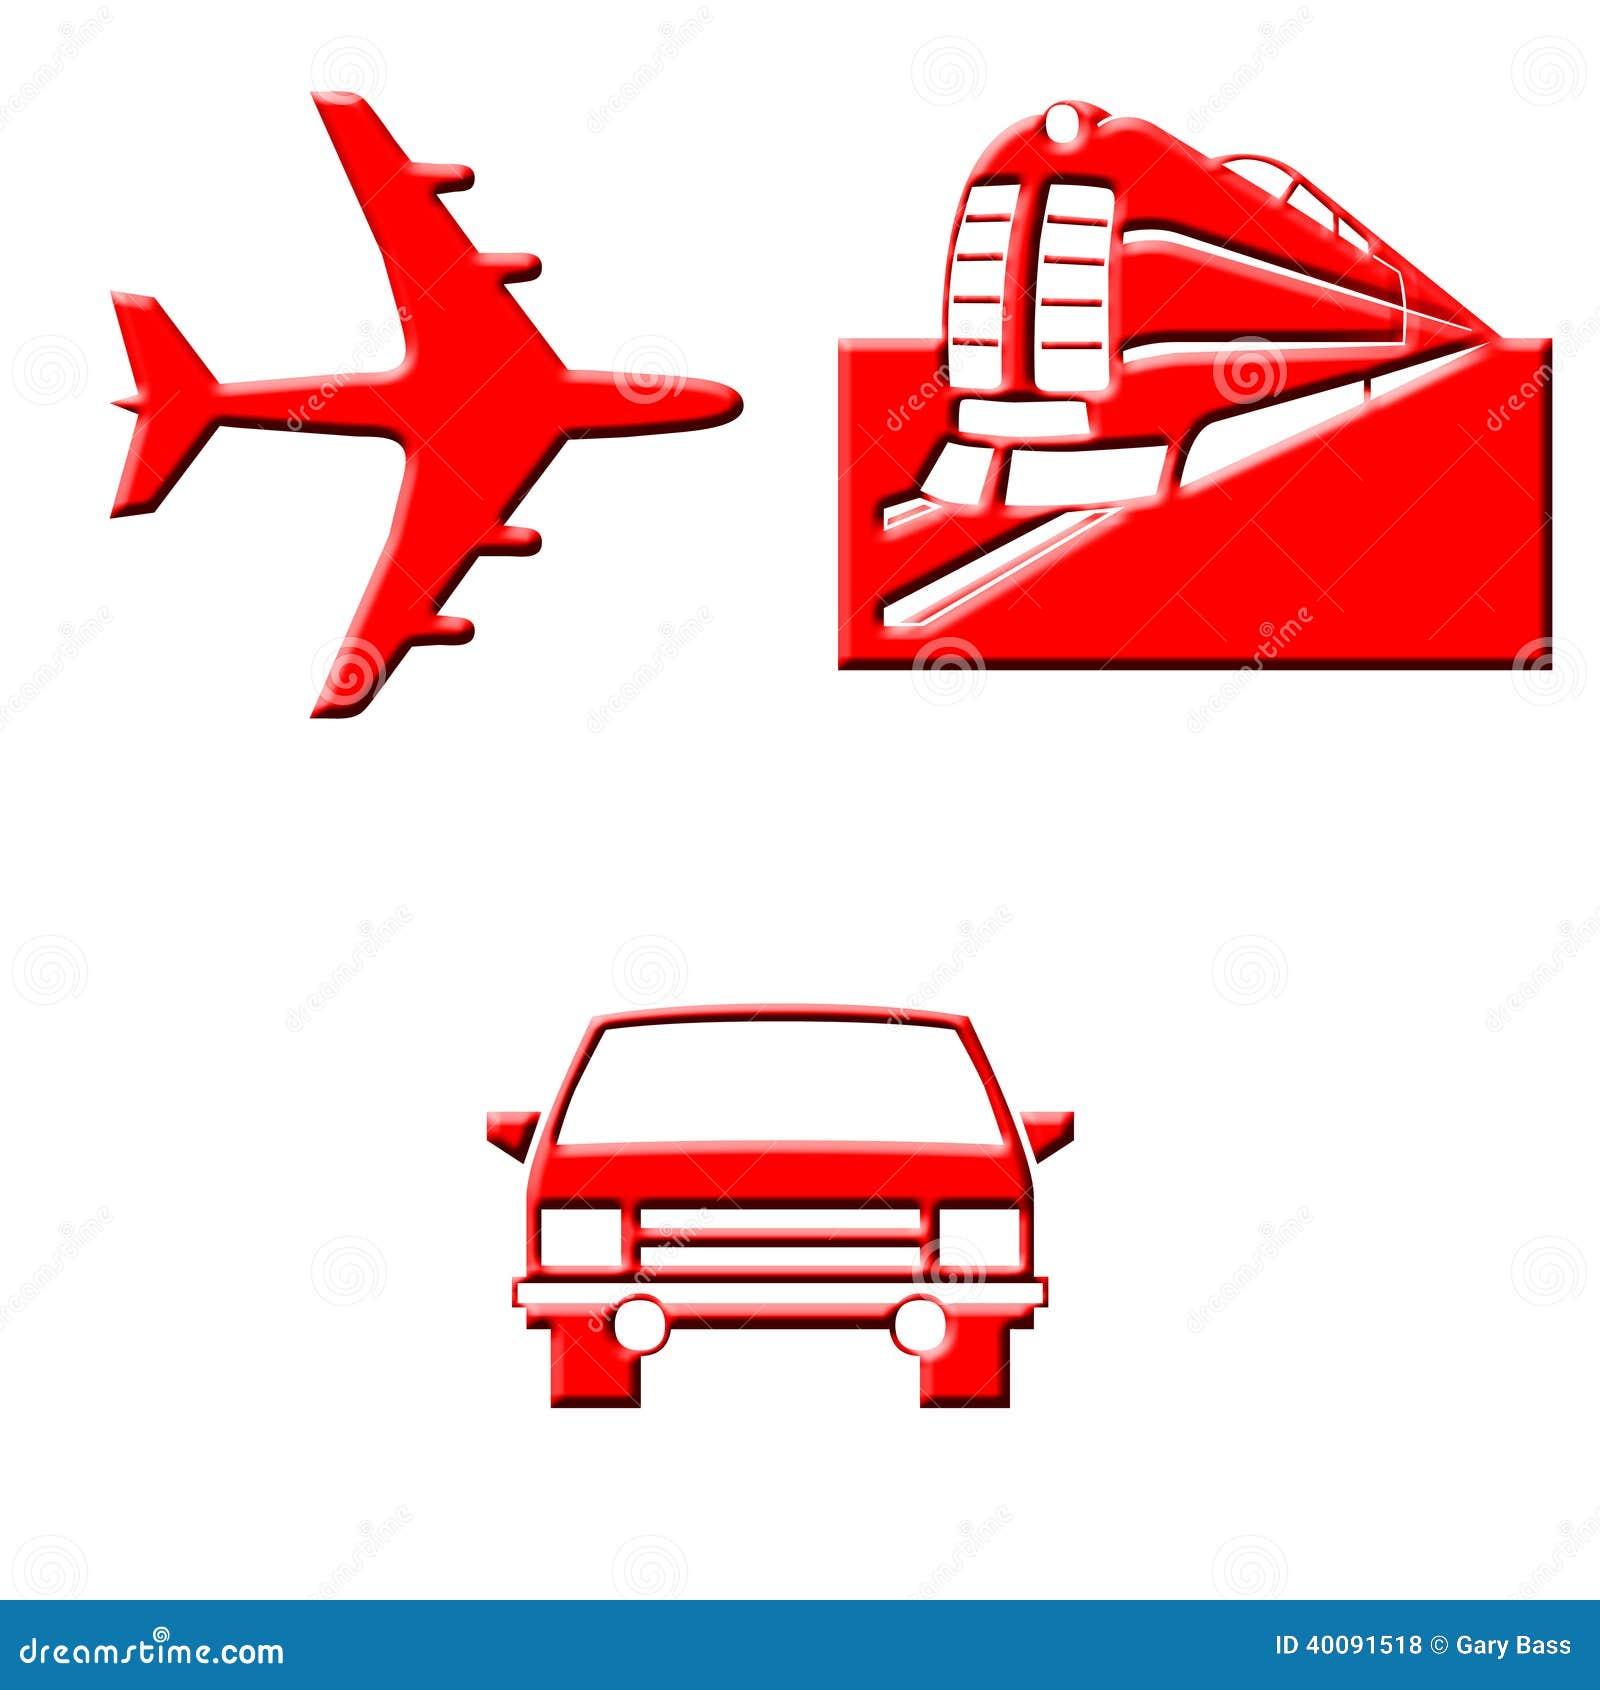 Planes Trains and Automobiles Those Aren t Pillows Edition Details